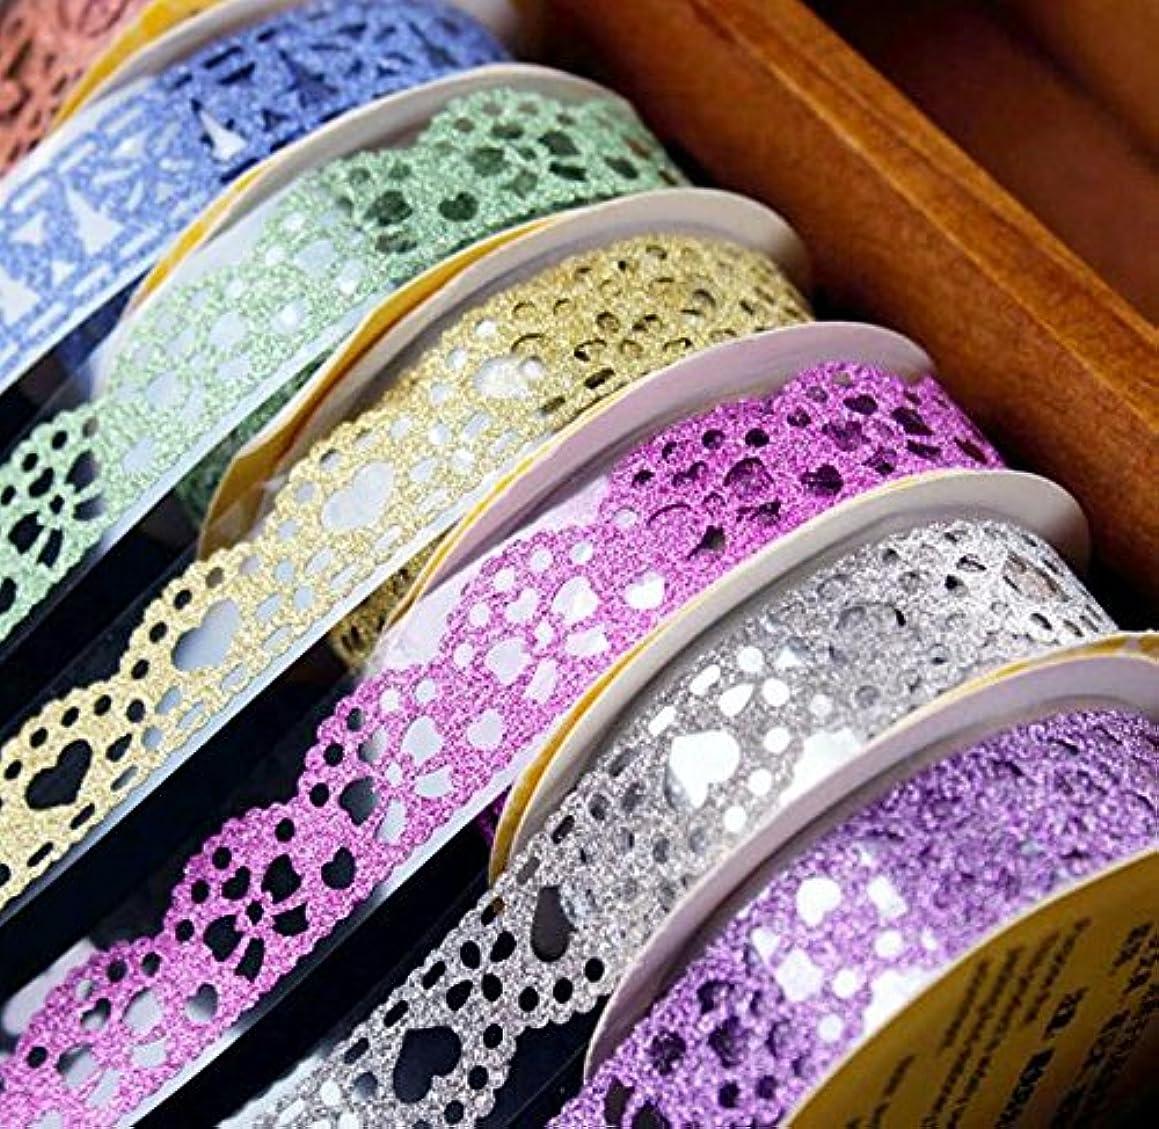 Washi Tape,Lace Pattern Glitter Bling Self-adhesive Tape,Diamond Washi Tape Masking DIY Scrapbooking Lace Tape Sticker 6 Roll Color random